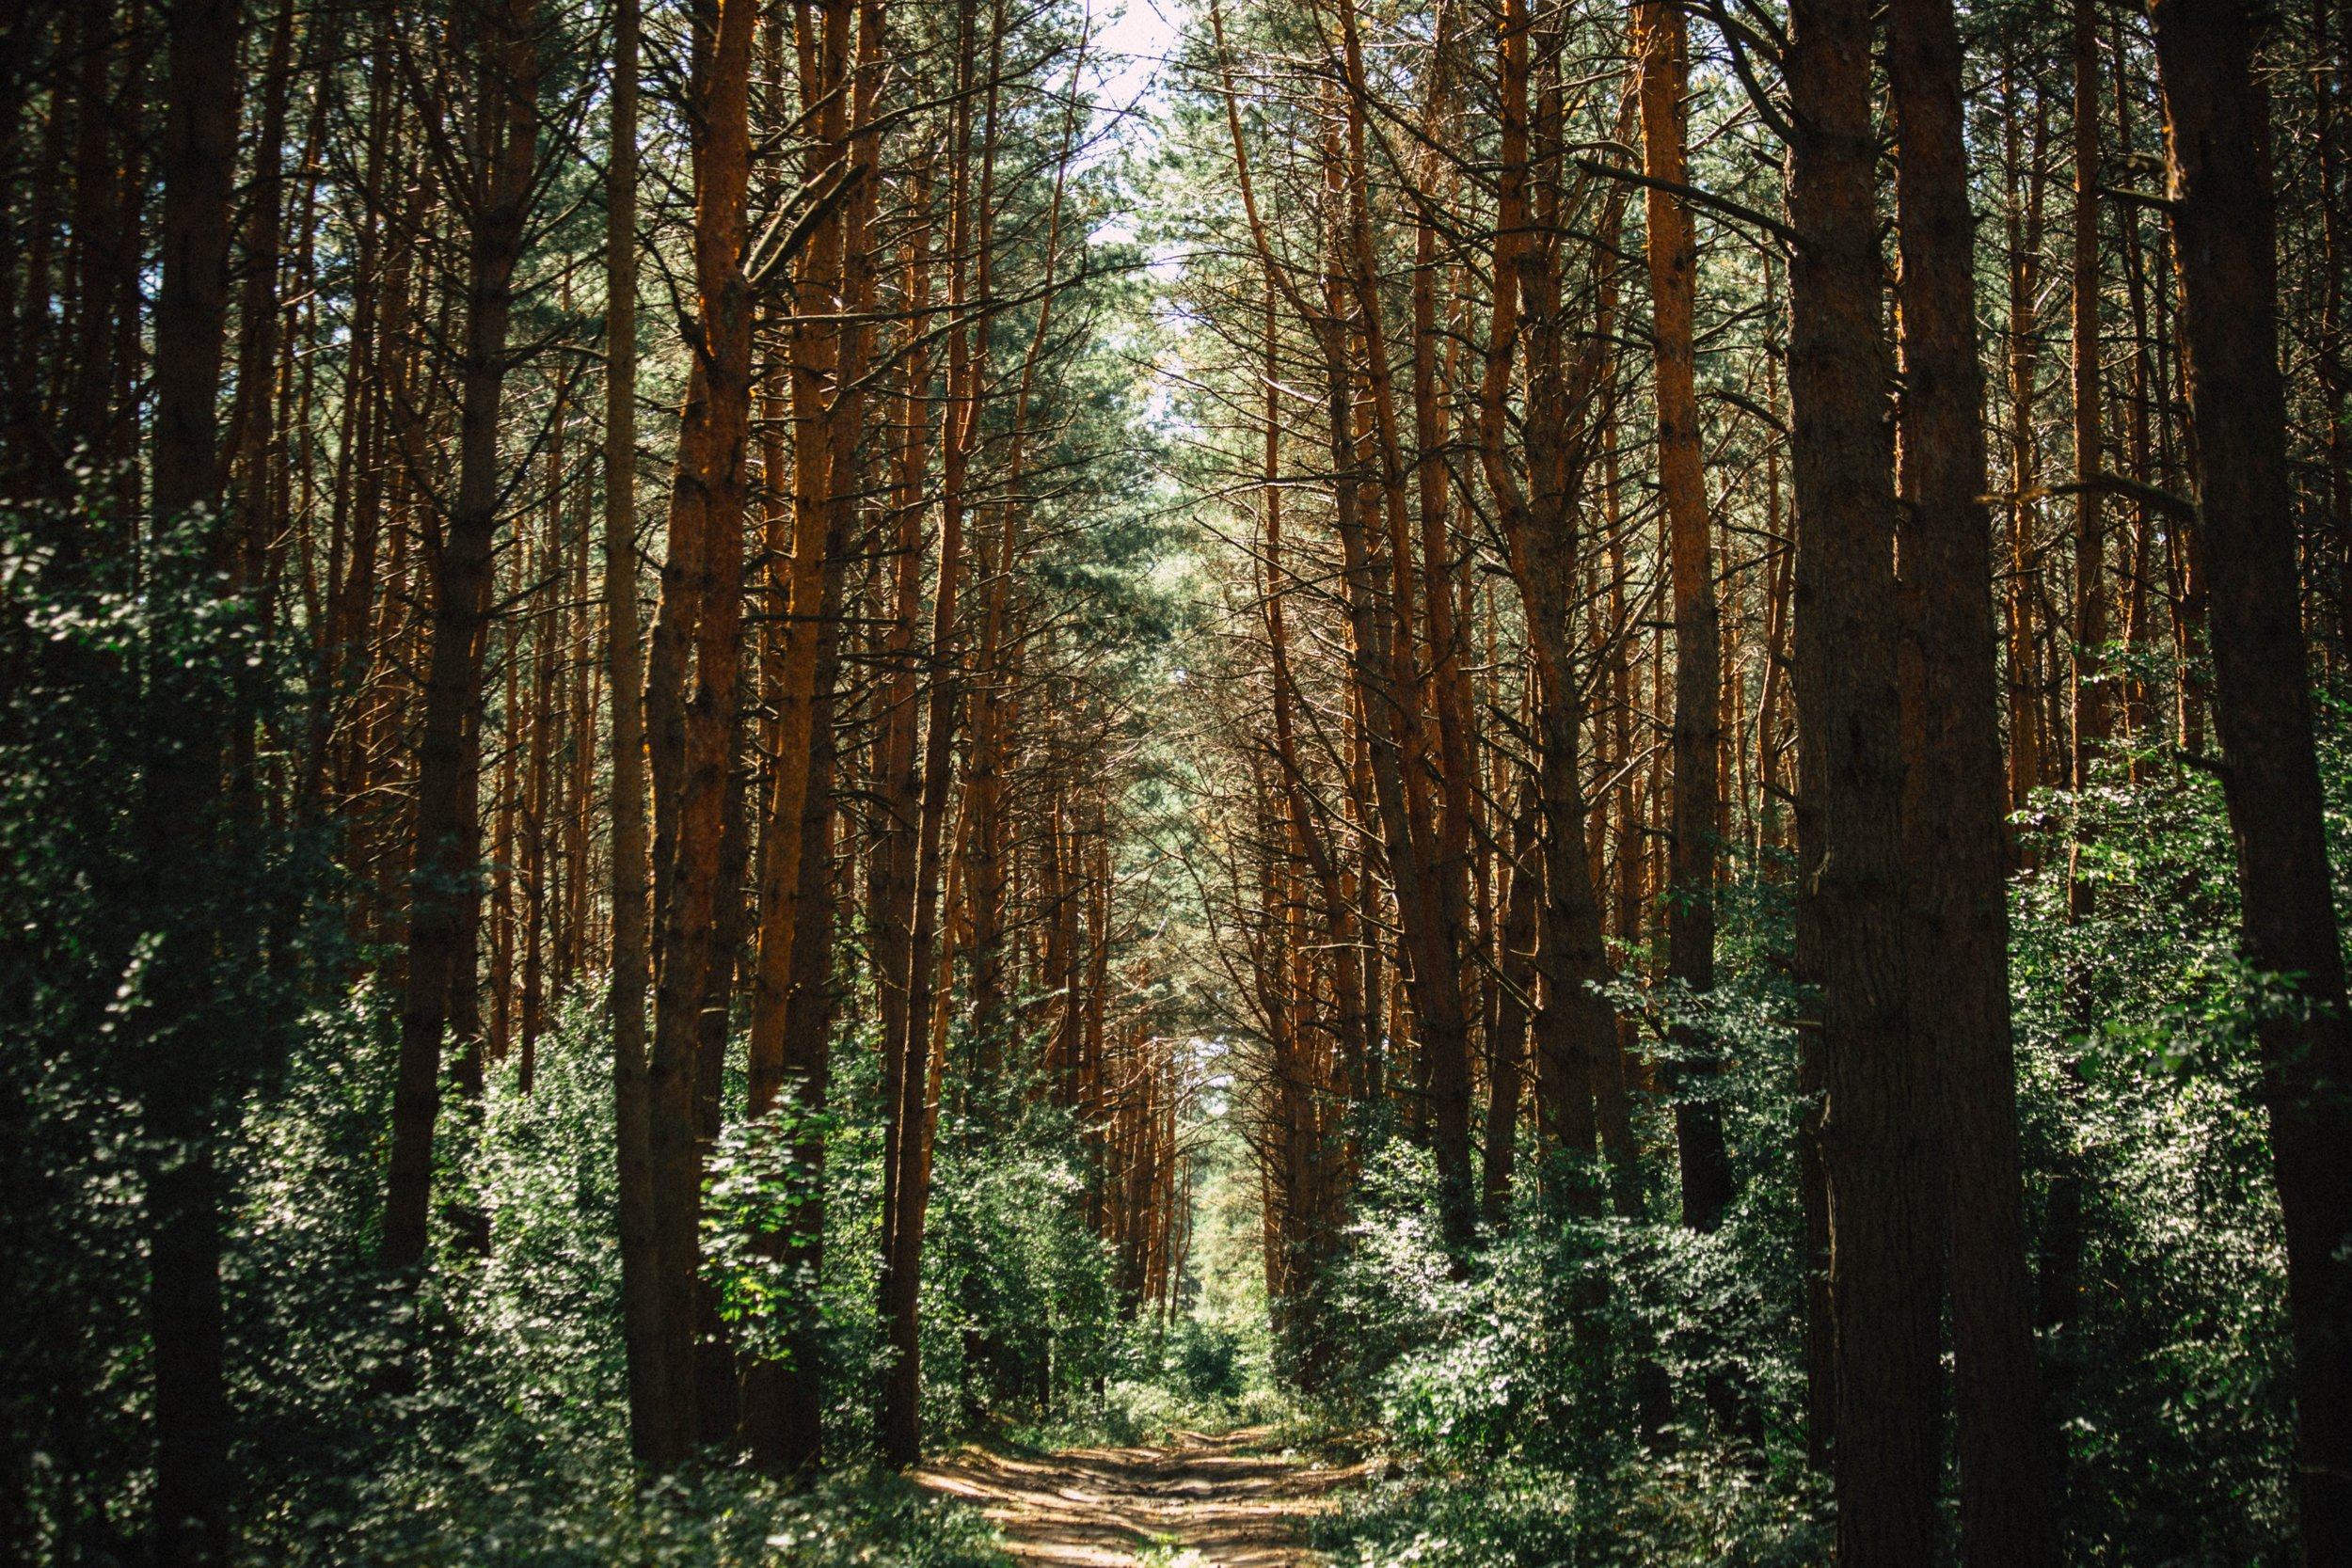 Lead to GROW - by Michael Winakur